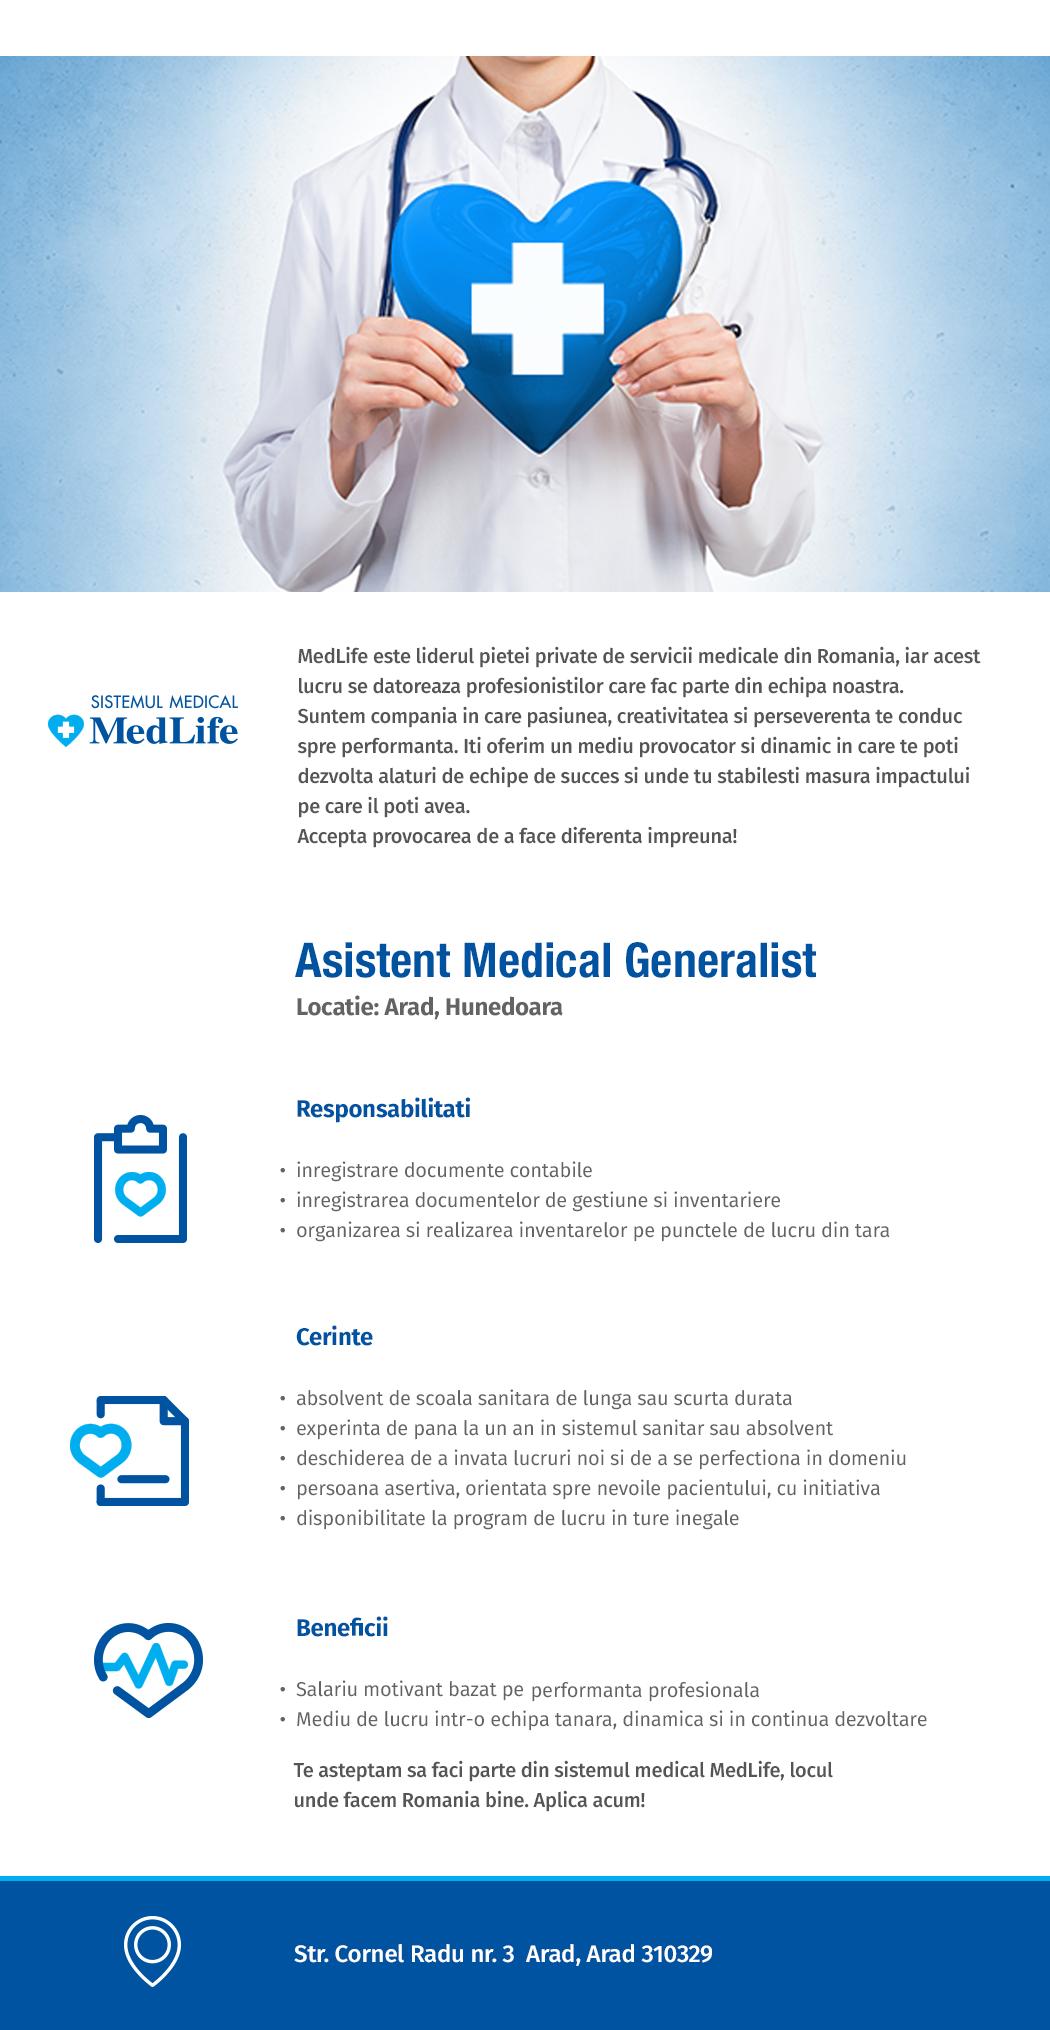 asistent-medical-generalist (1)